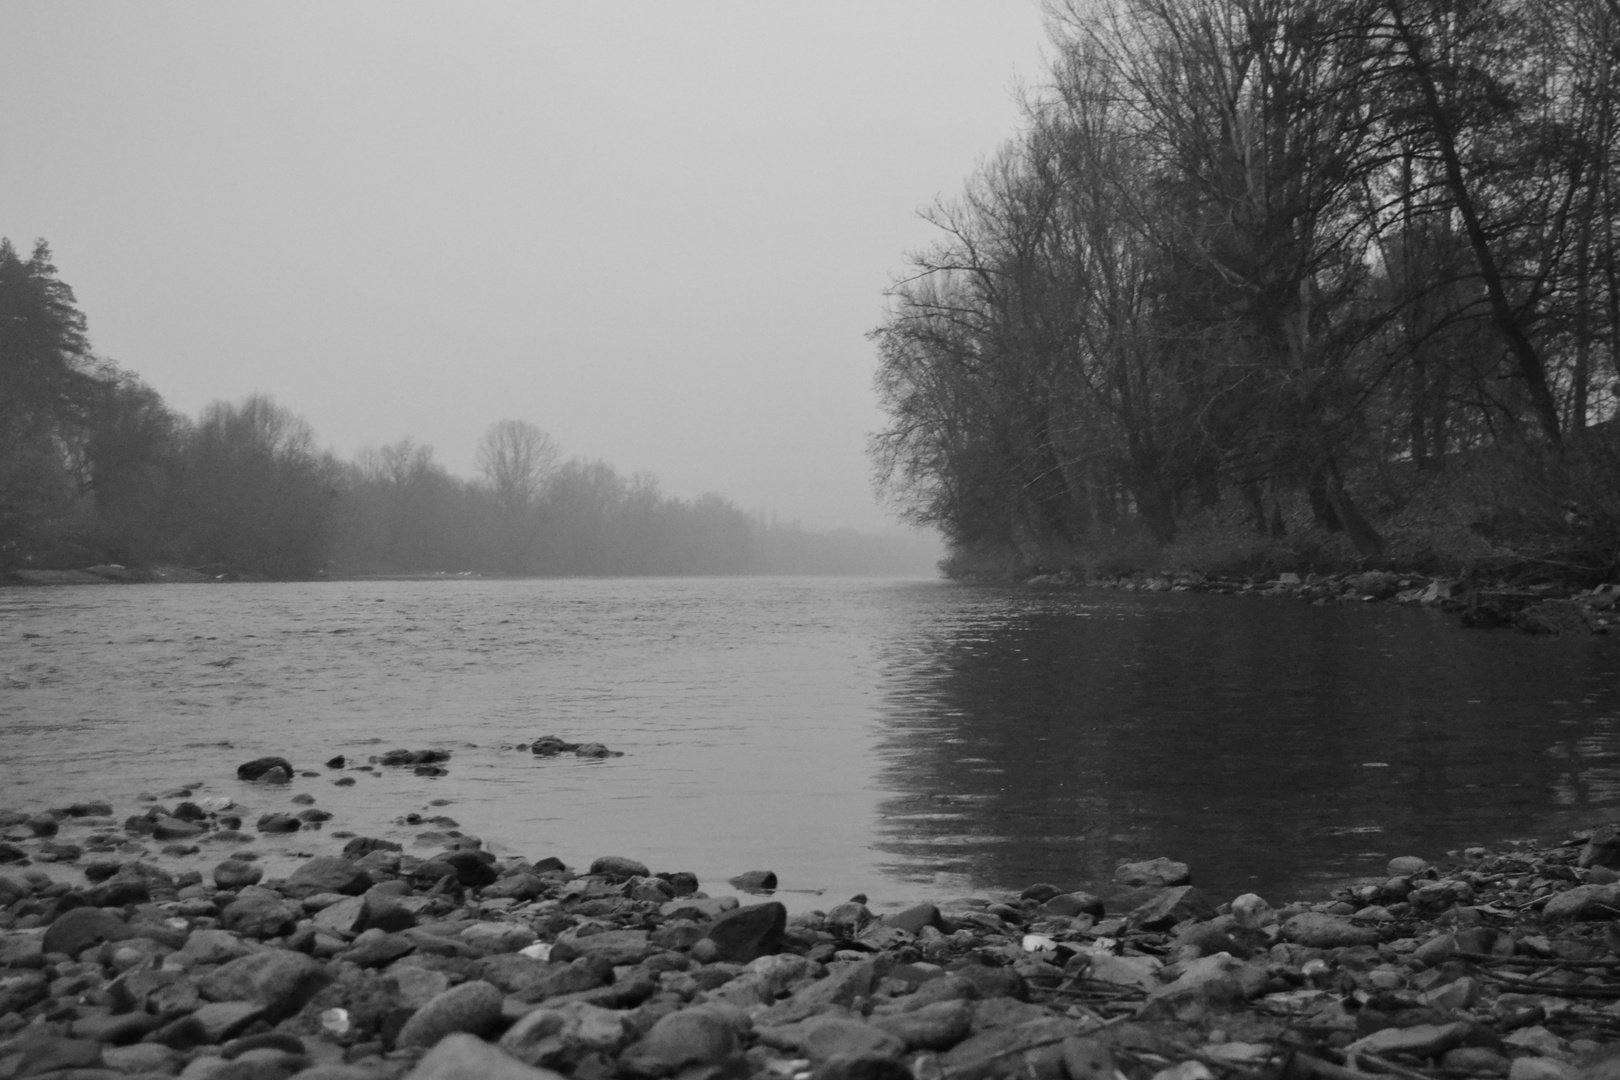 fiume (: